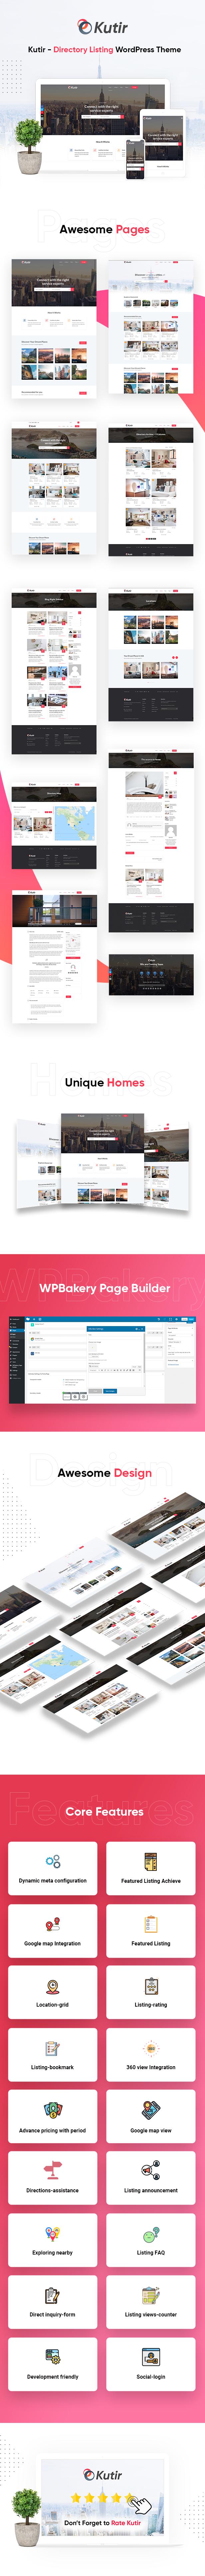 Kutir - Directory Listing WordPress Vorlage - 1